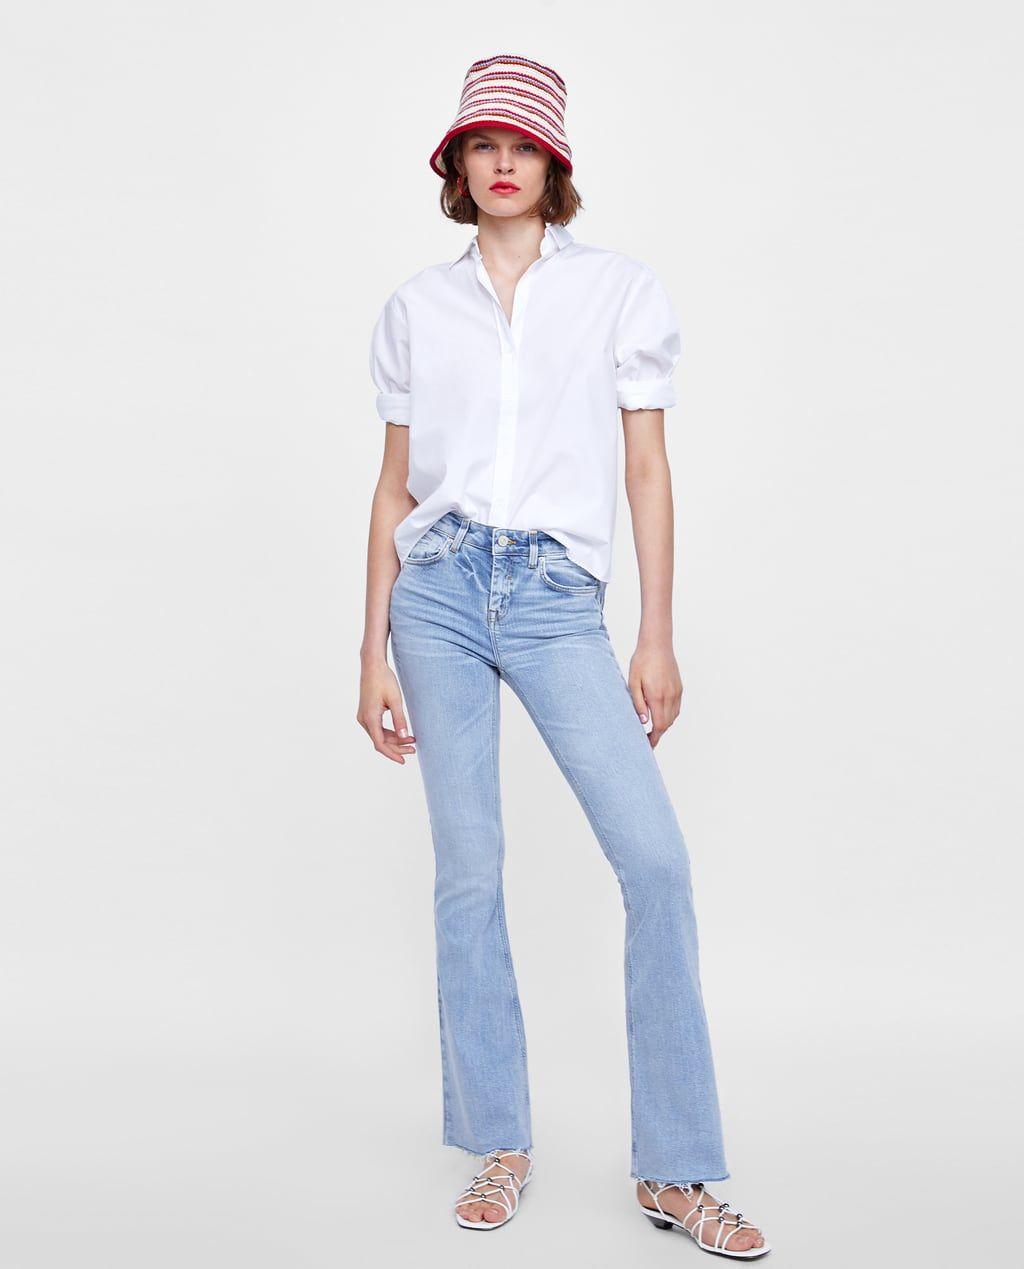 dbd7d684 JEANS FLARE SUPER BLEACH | Zara women | Bleached jeans, Jeans, Flare ...